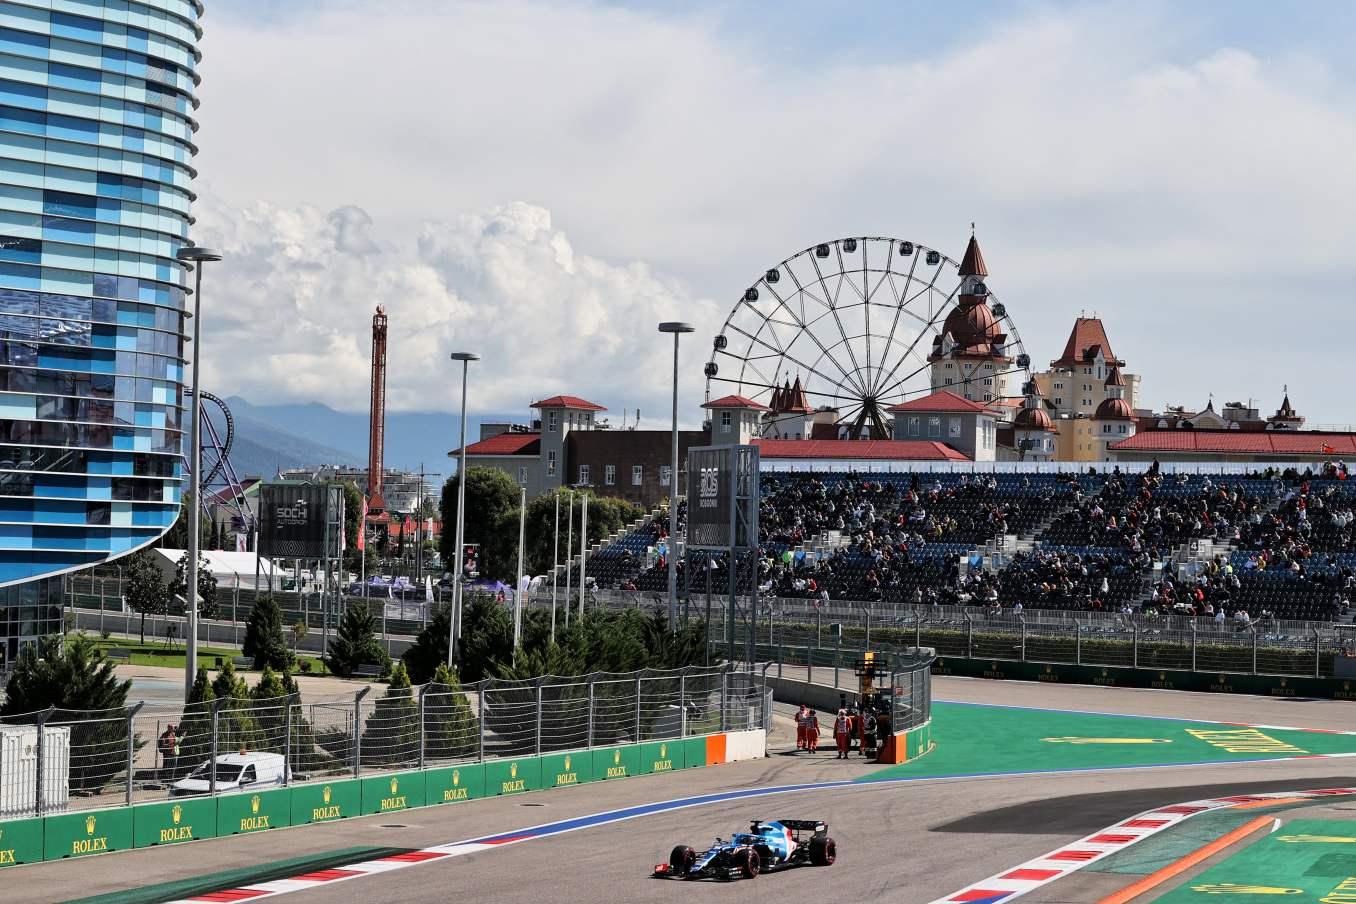 Alpine F1 Team P6 grand prix russie 27   P6 pour Alpine F1 Team et Alonso en Russie